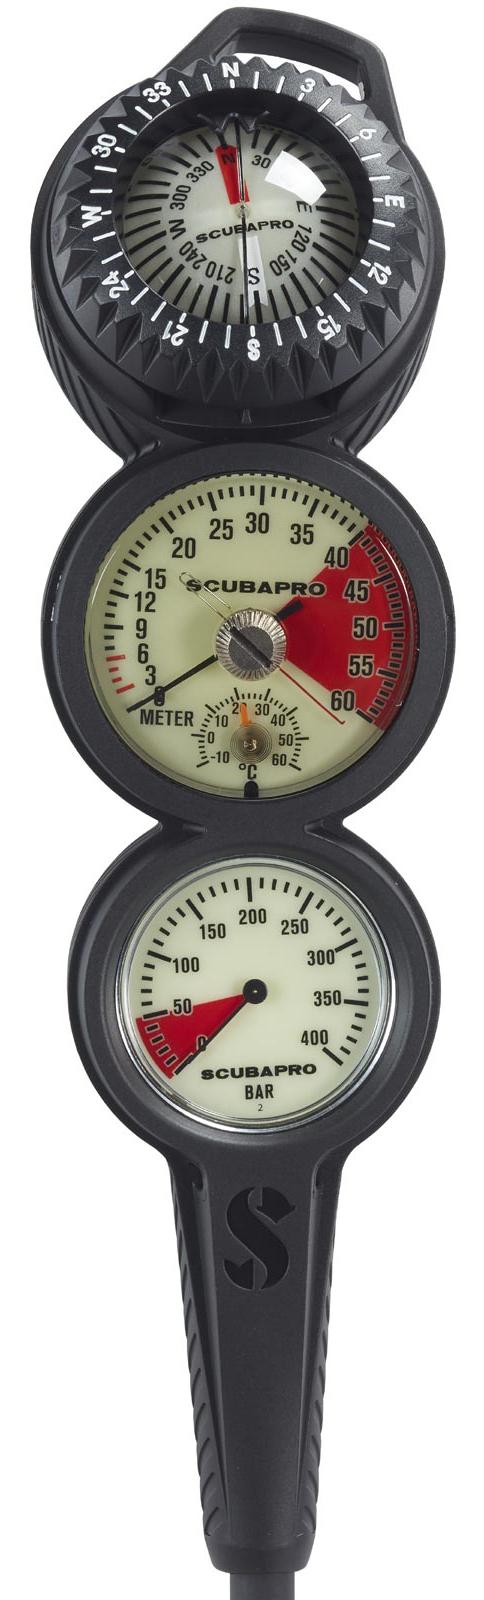 Scubapro 2 Gauge In-Line Console